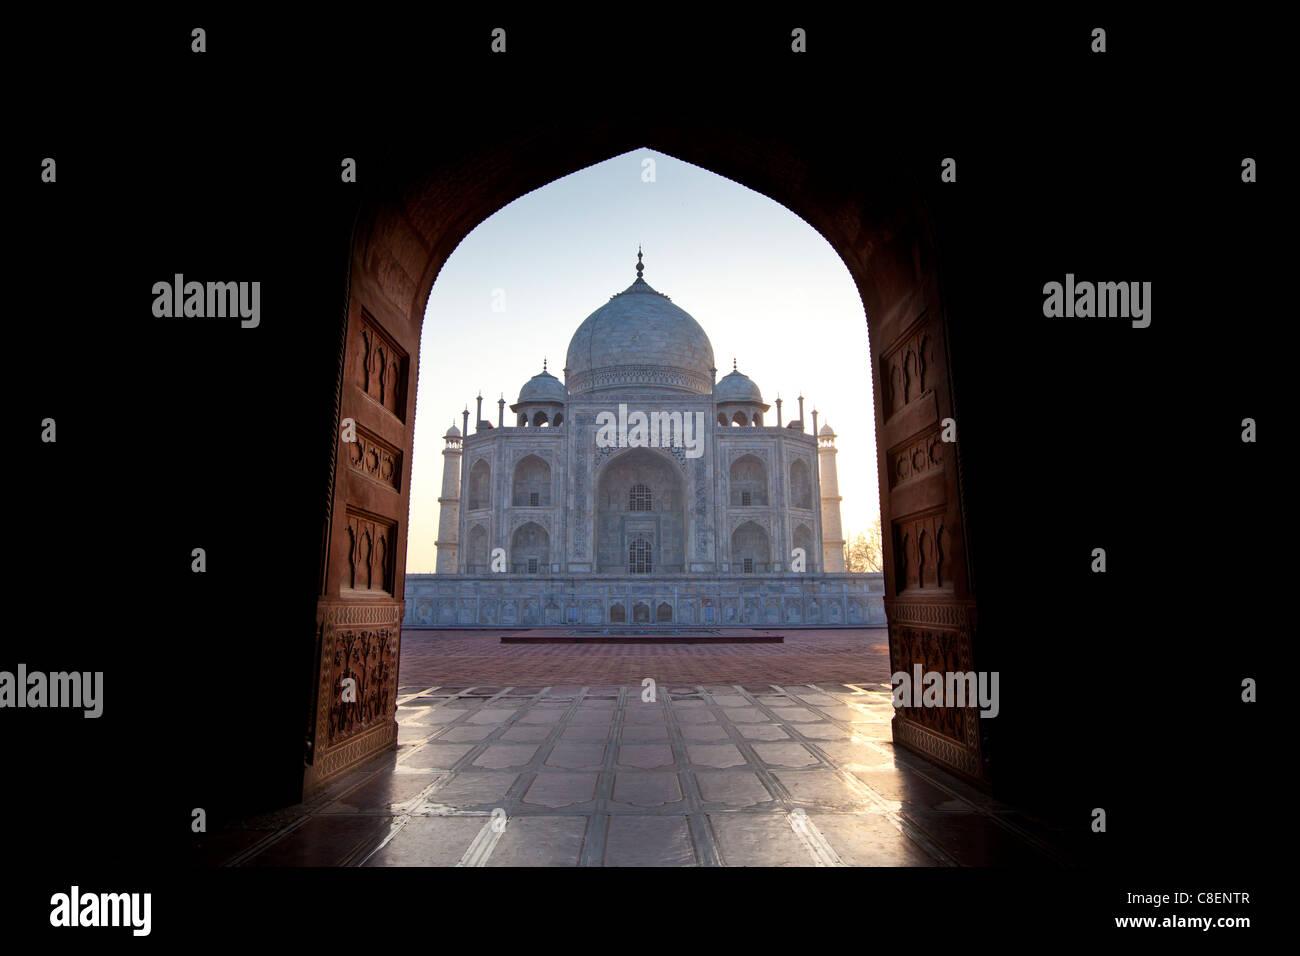 Il Taj Mahal mausoleo vista occidentale (visto dal Taj Mahal Moschea) all'alba, Uttar Pradesh, India Immagini Stock